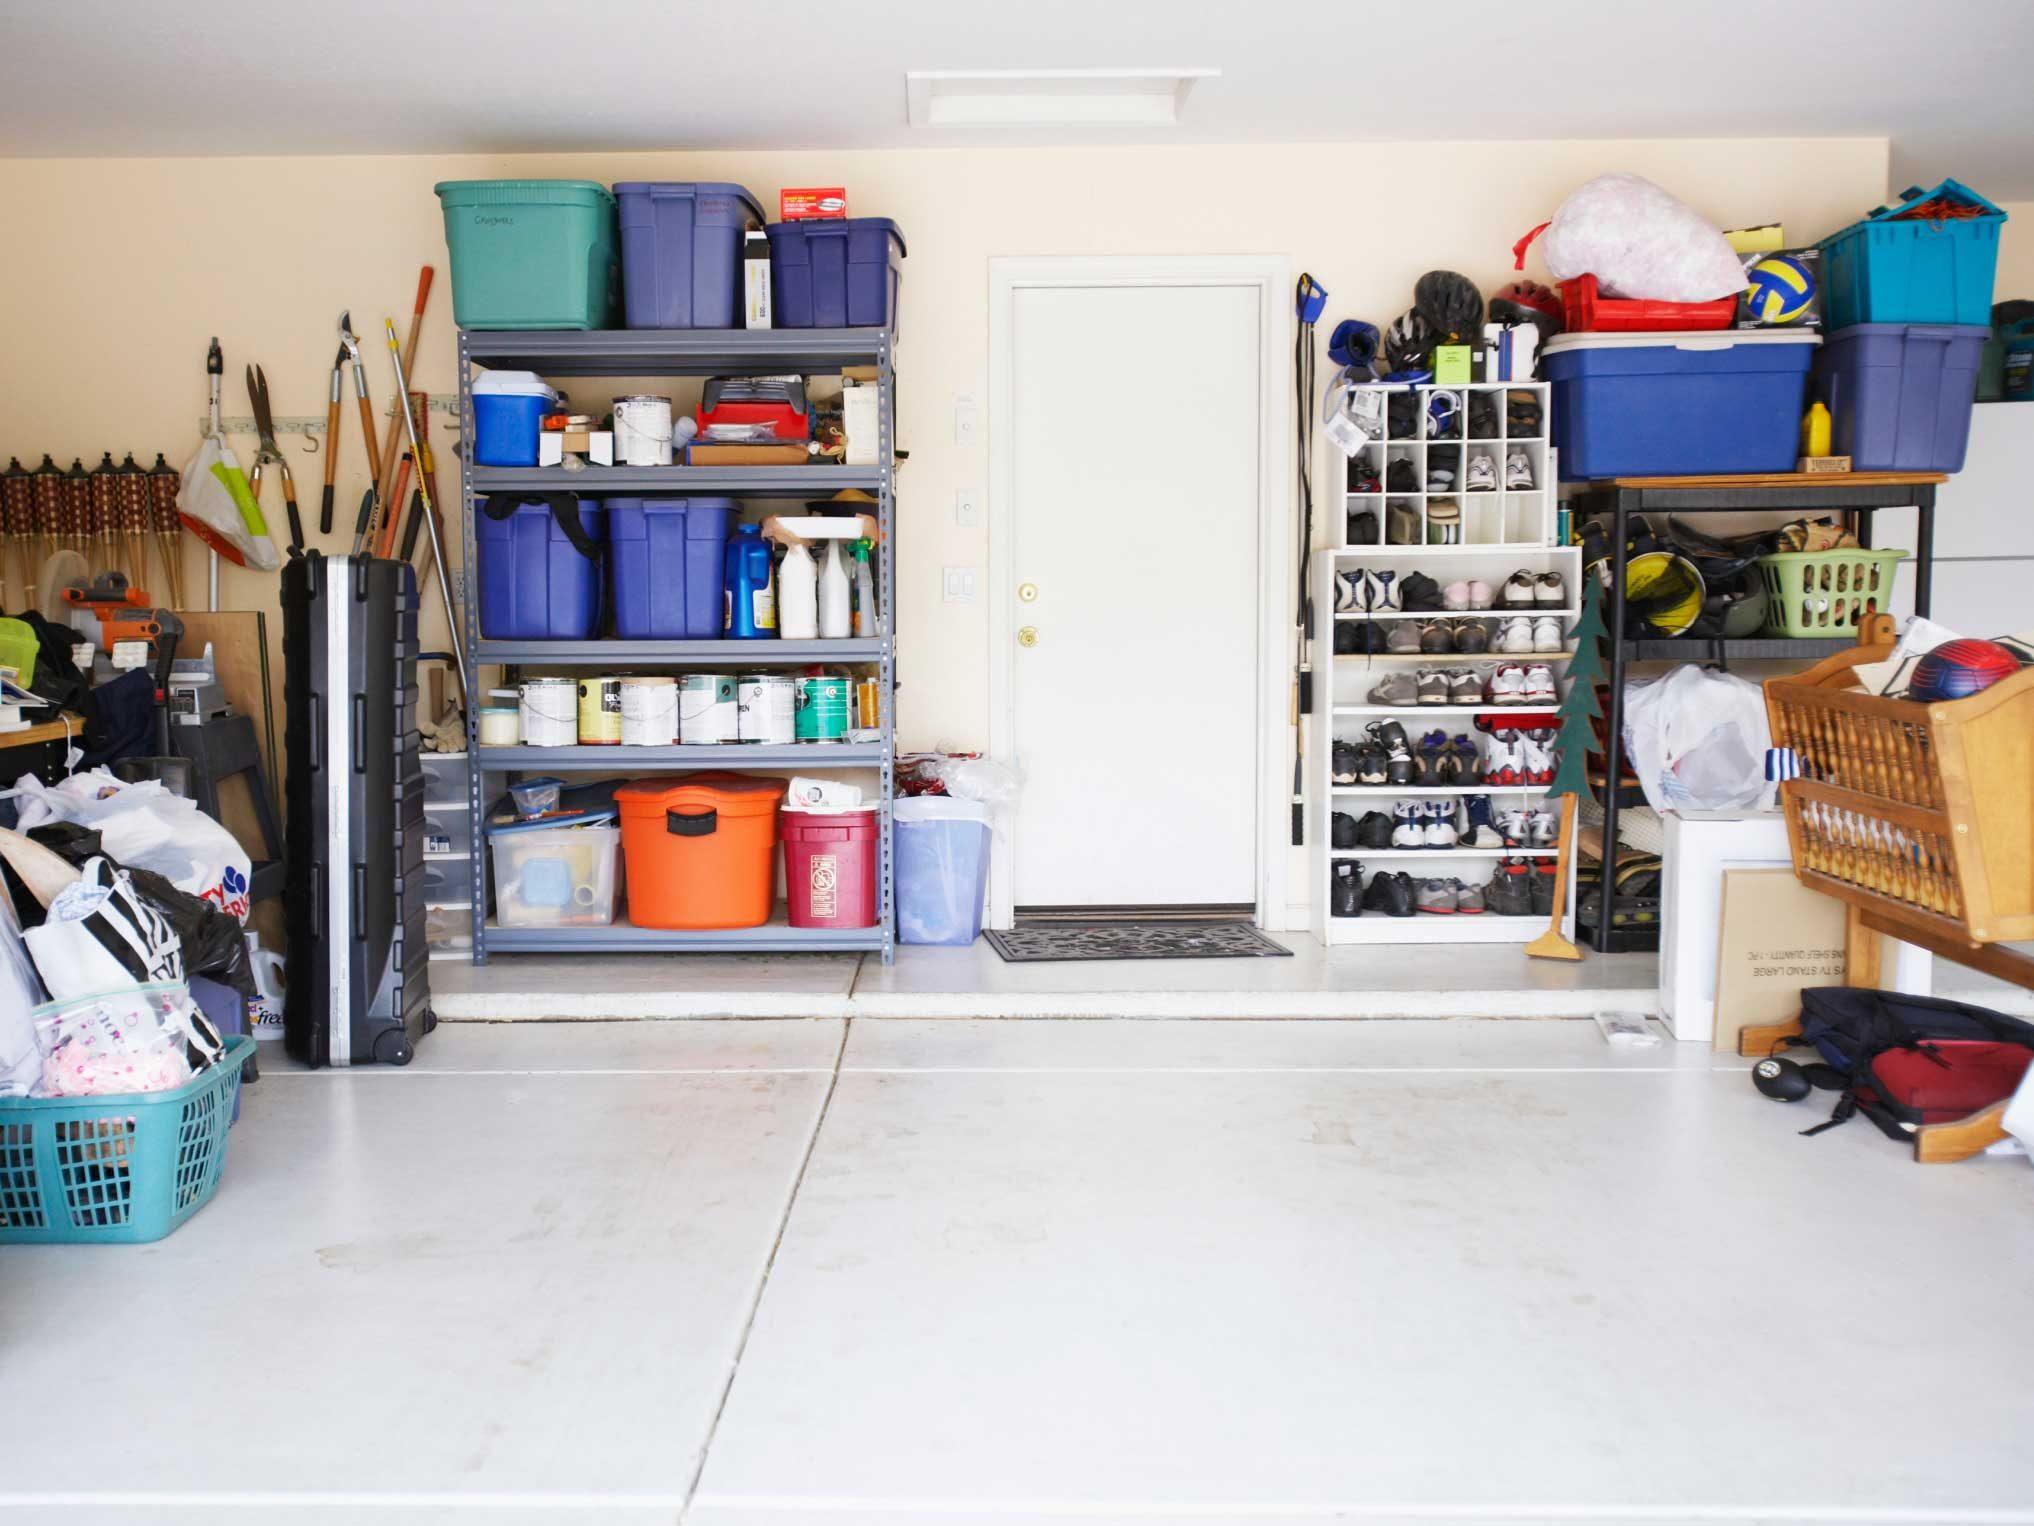 Organizing Hacks for the Garage